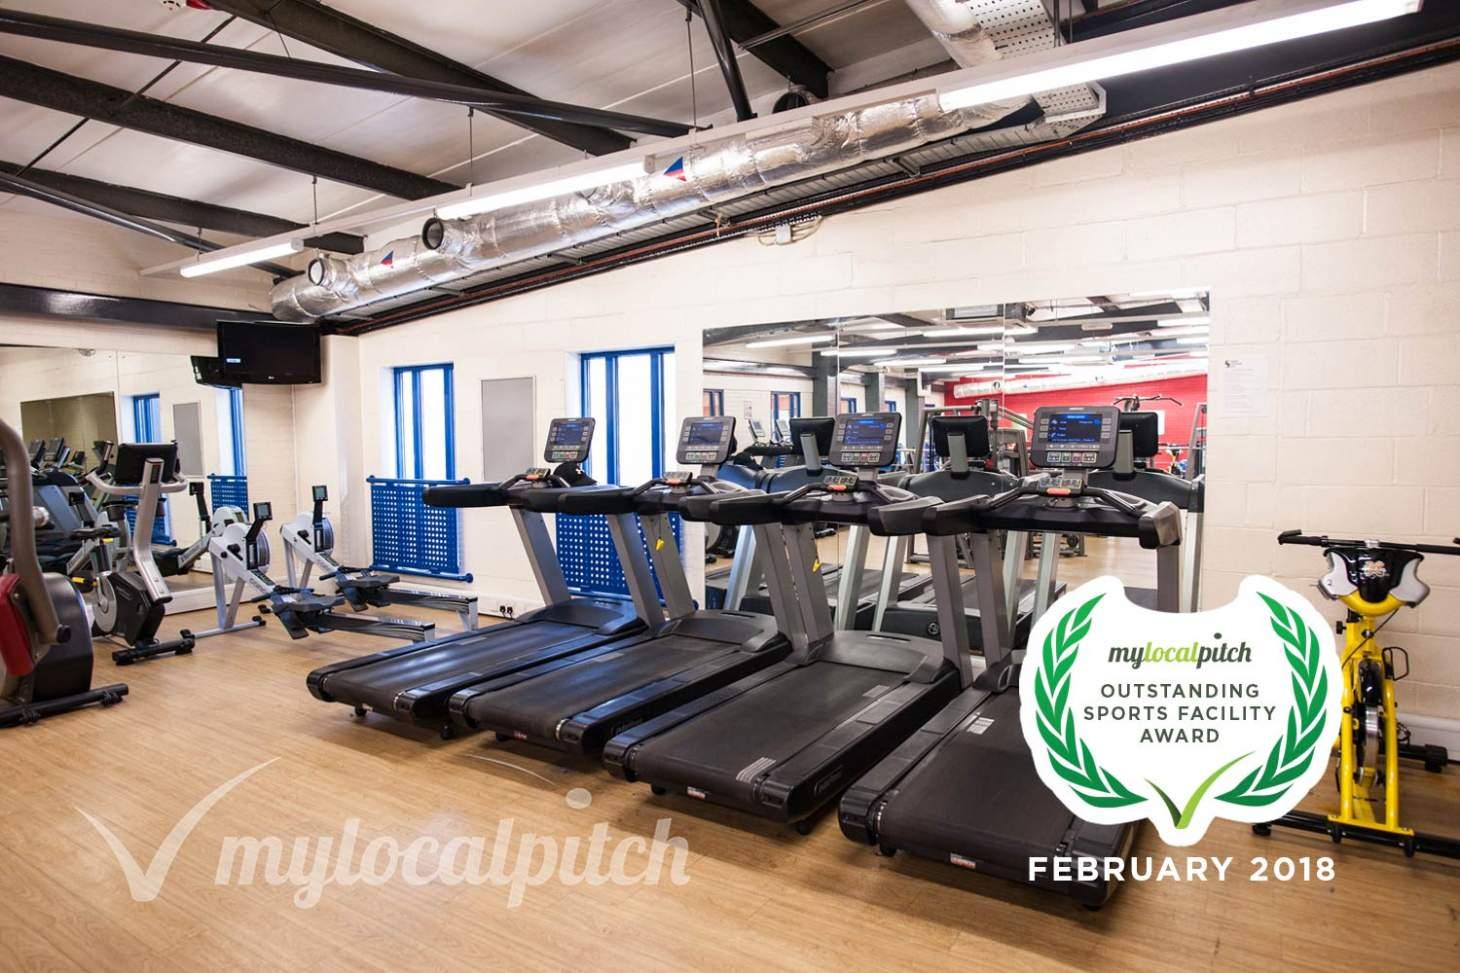 Ordsall Leisure Centre Gym gym